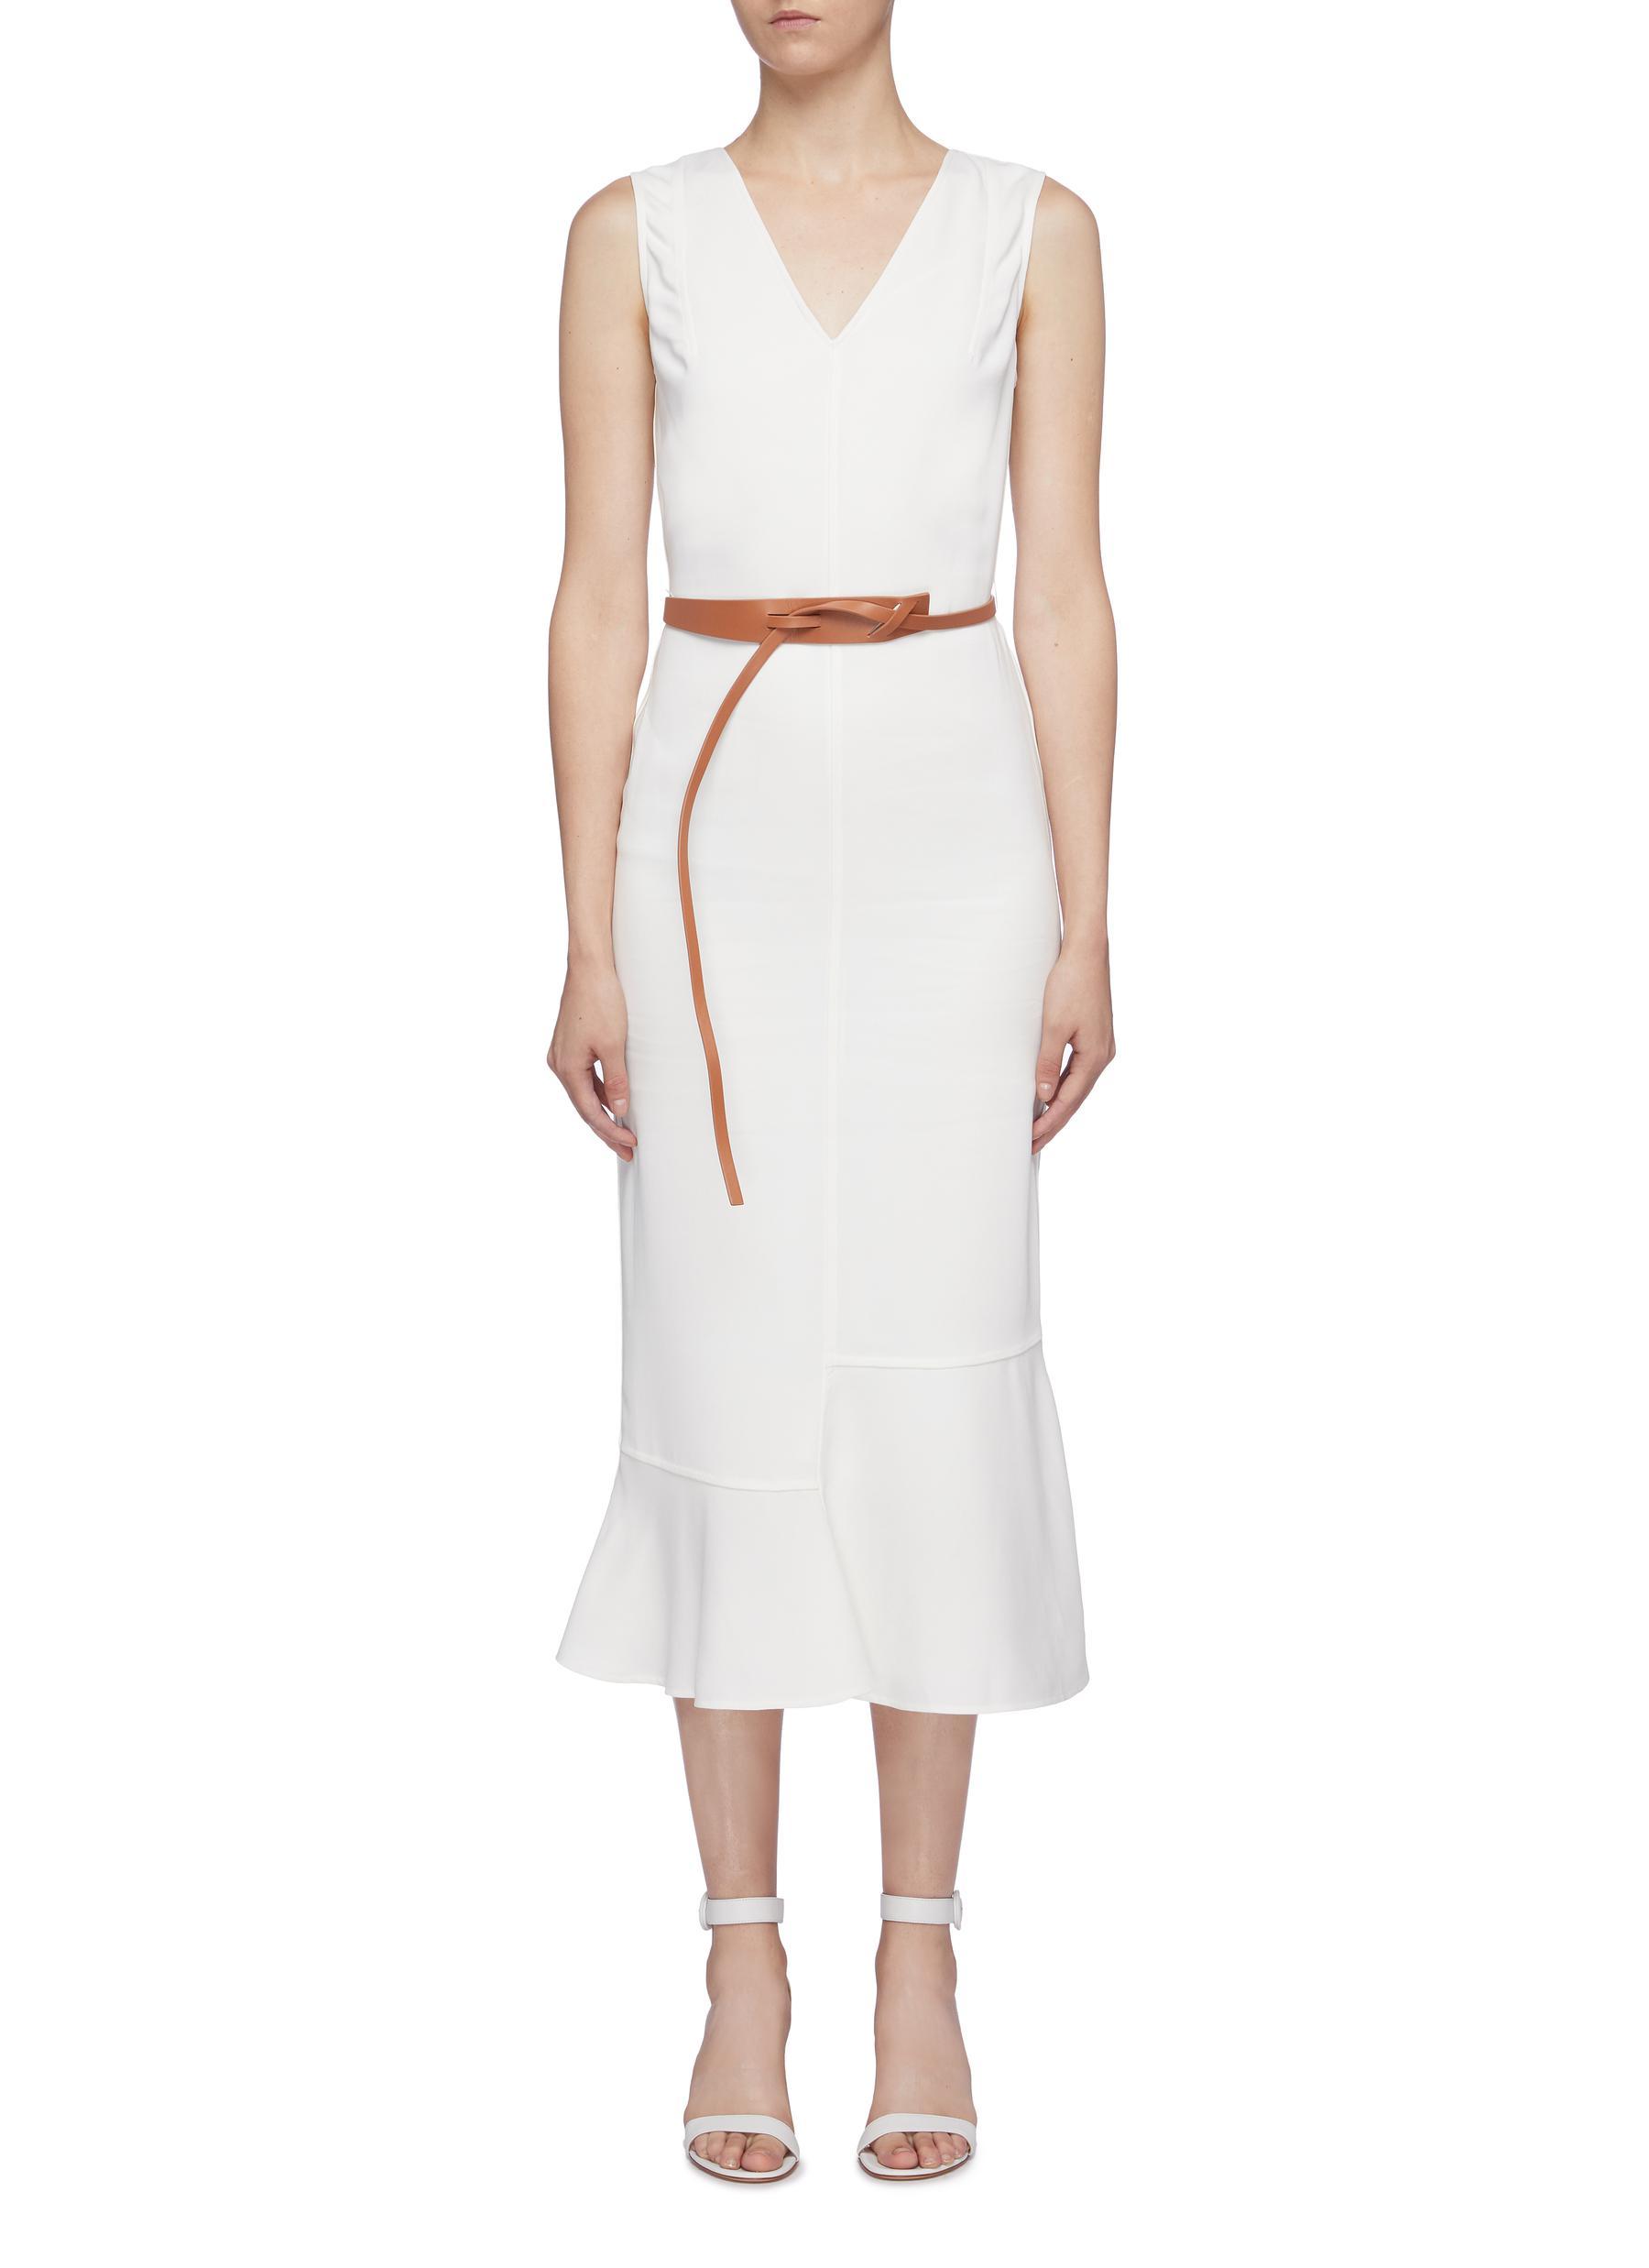 Belted asymmetric ruffle hem sleeveless georgette V-neck dress by Victoria Beckham